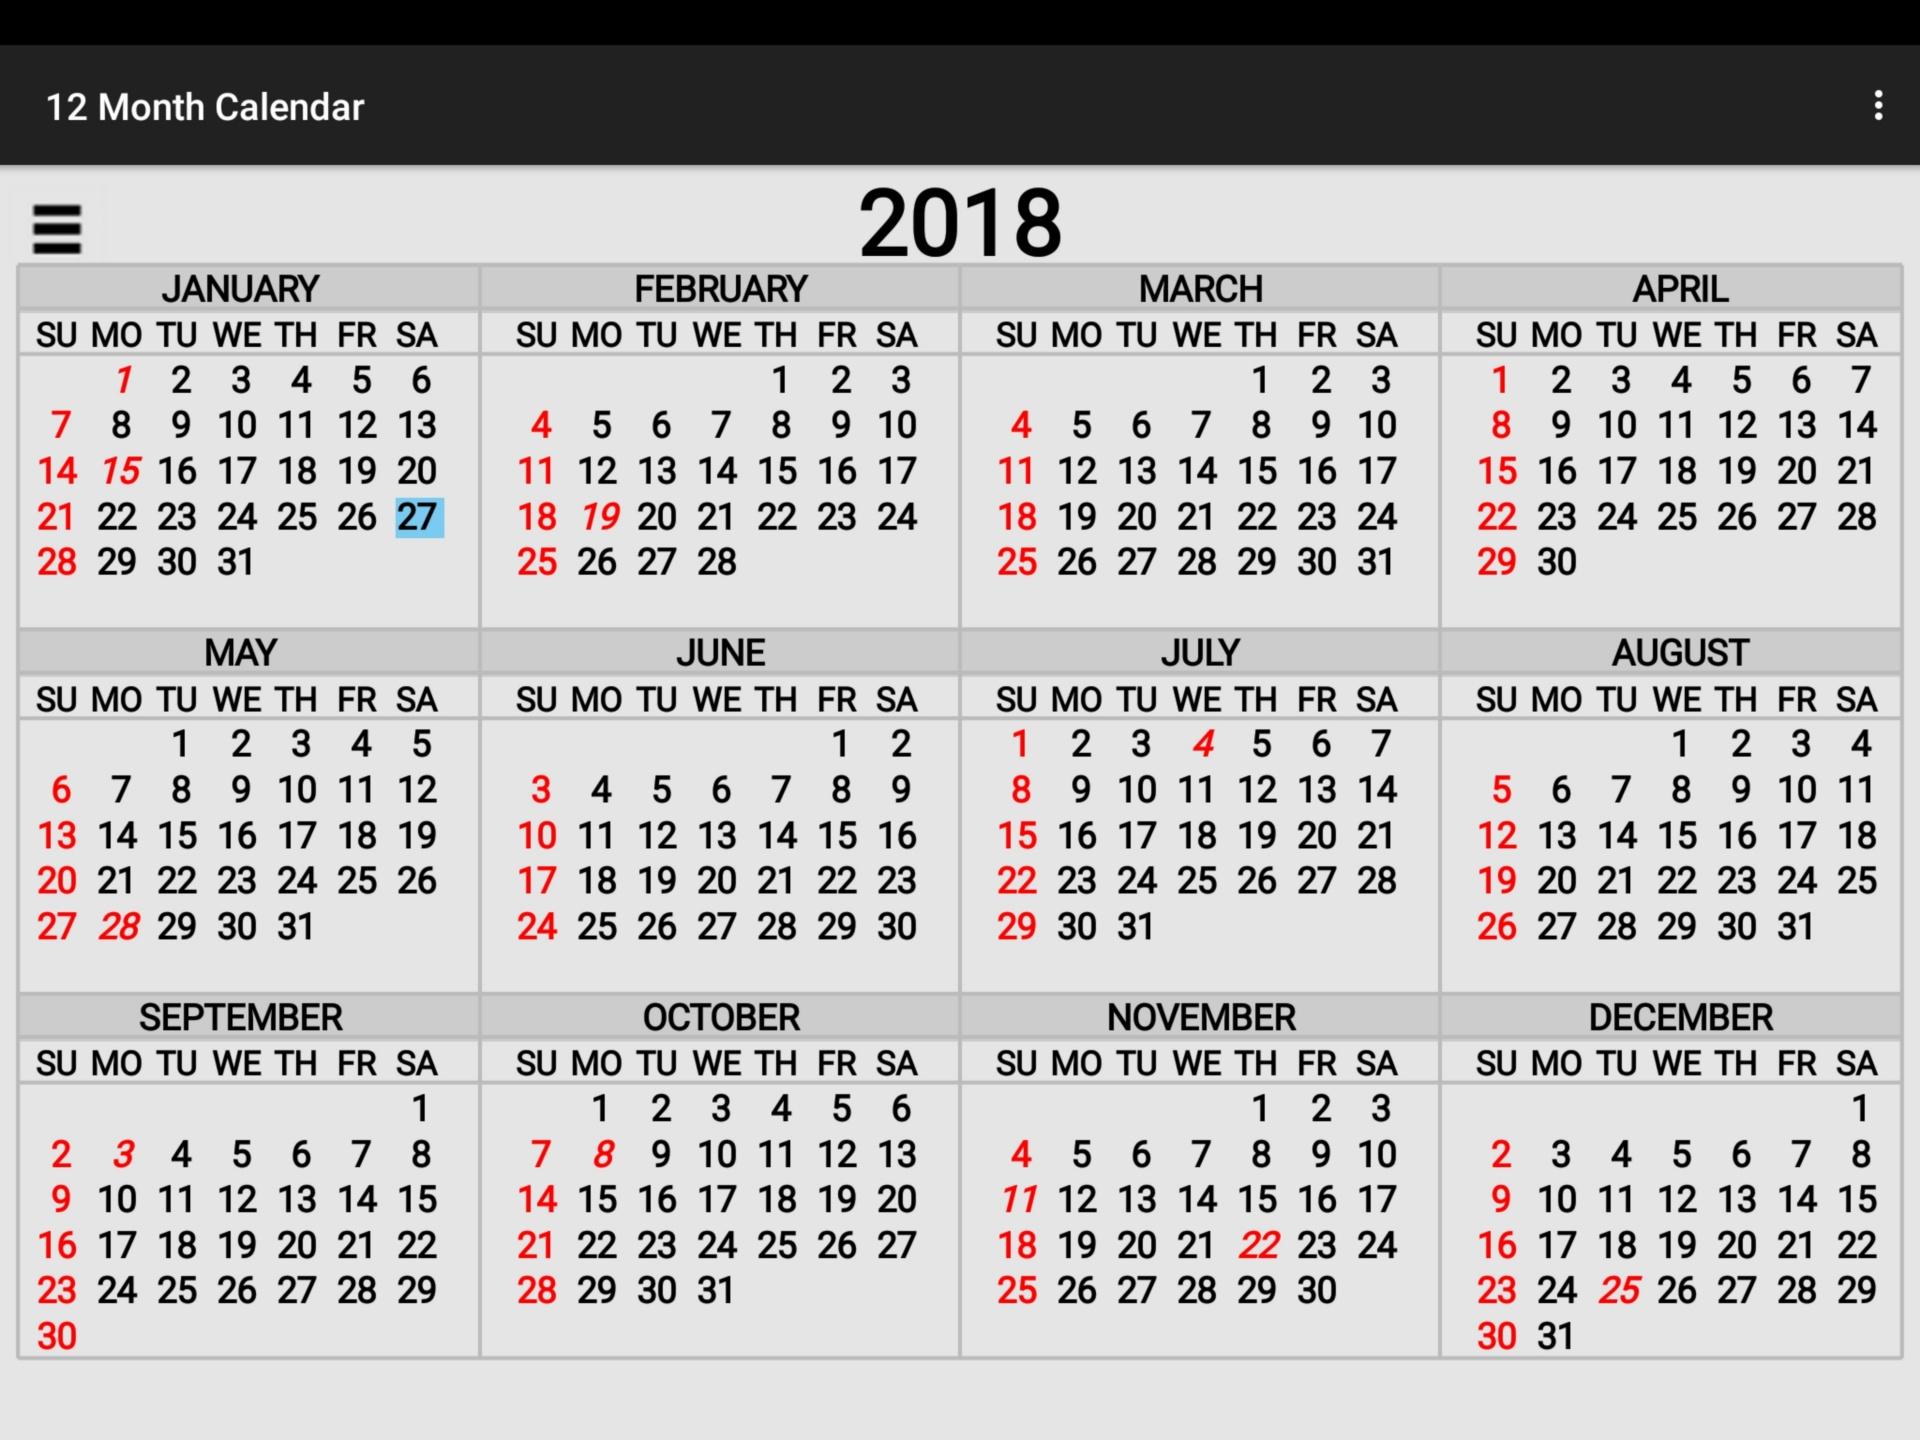 Simple,2018,annual,calendar,12 - free image from needpix.com